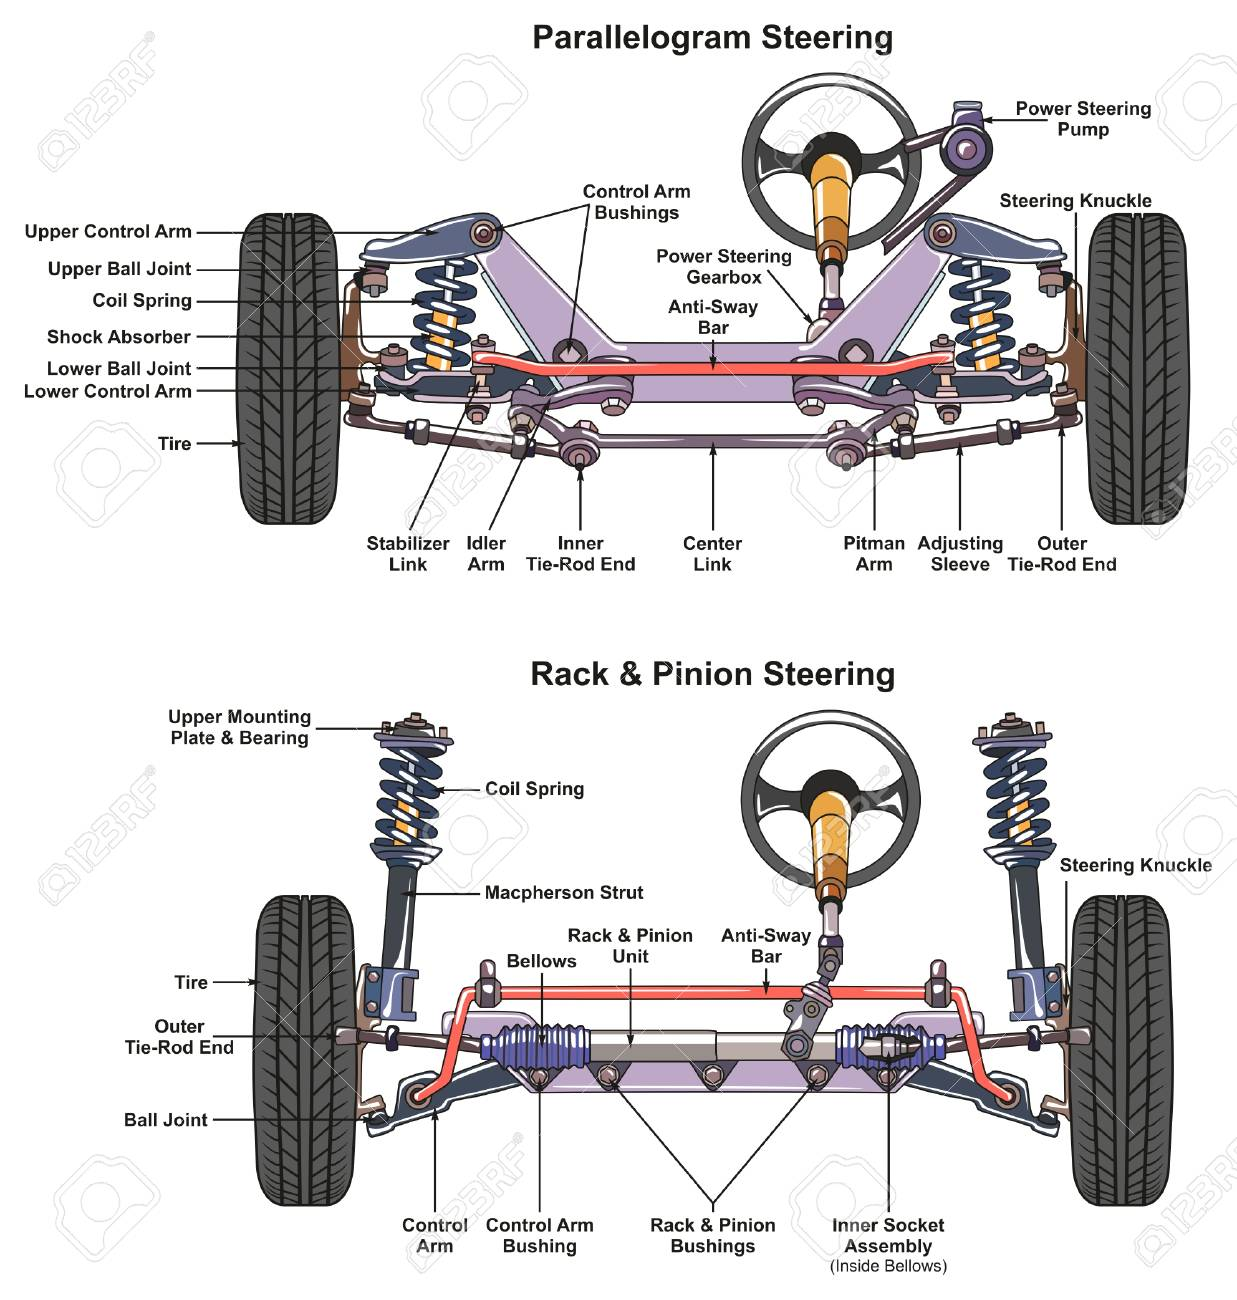 hight resolution of steering diagram car wiring diagram db automotive steering system infographic diagram showing both types steering diagram